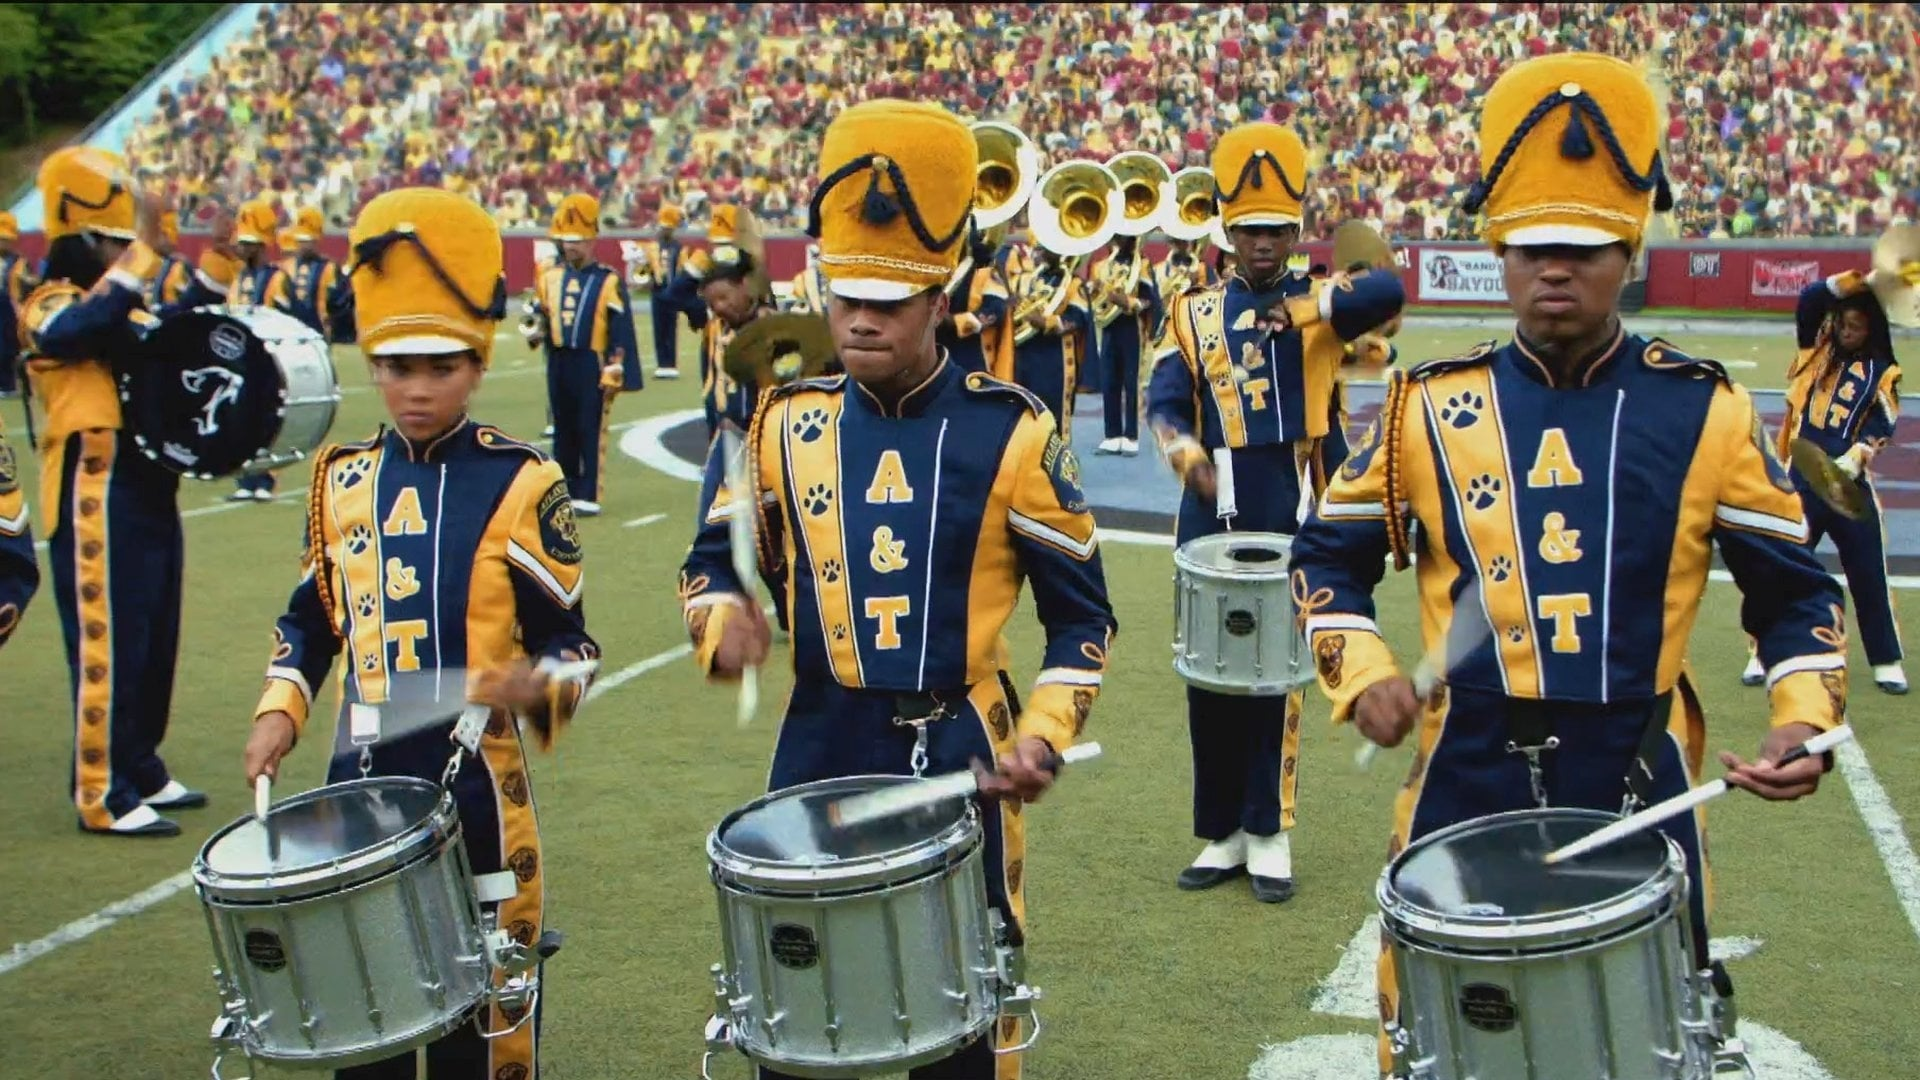 drumline 2002 the movie